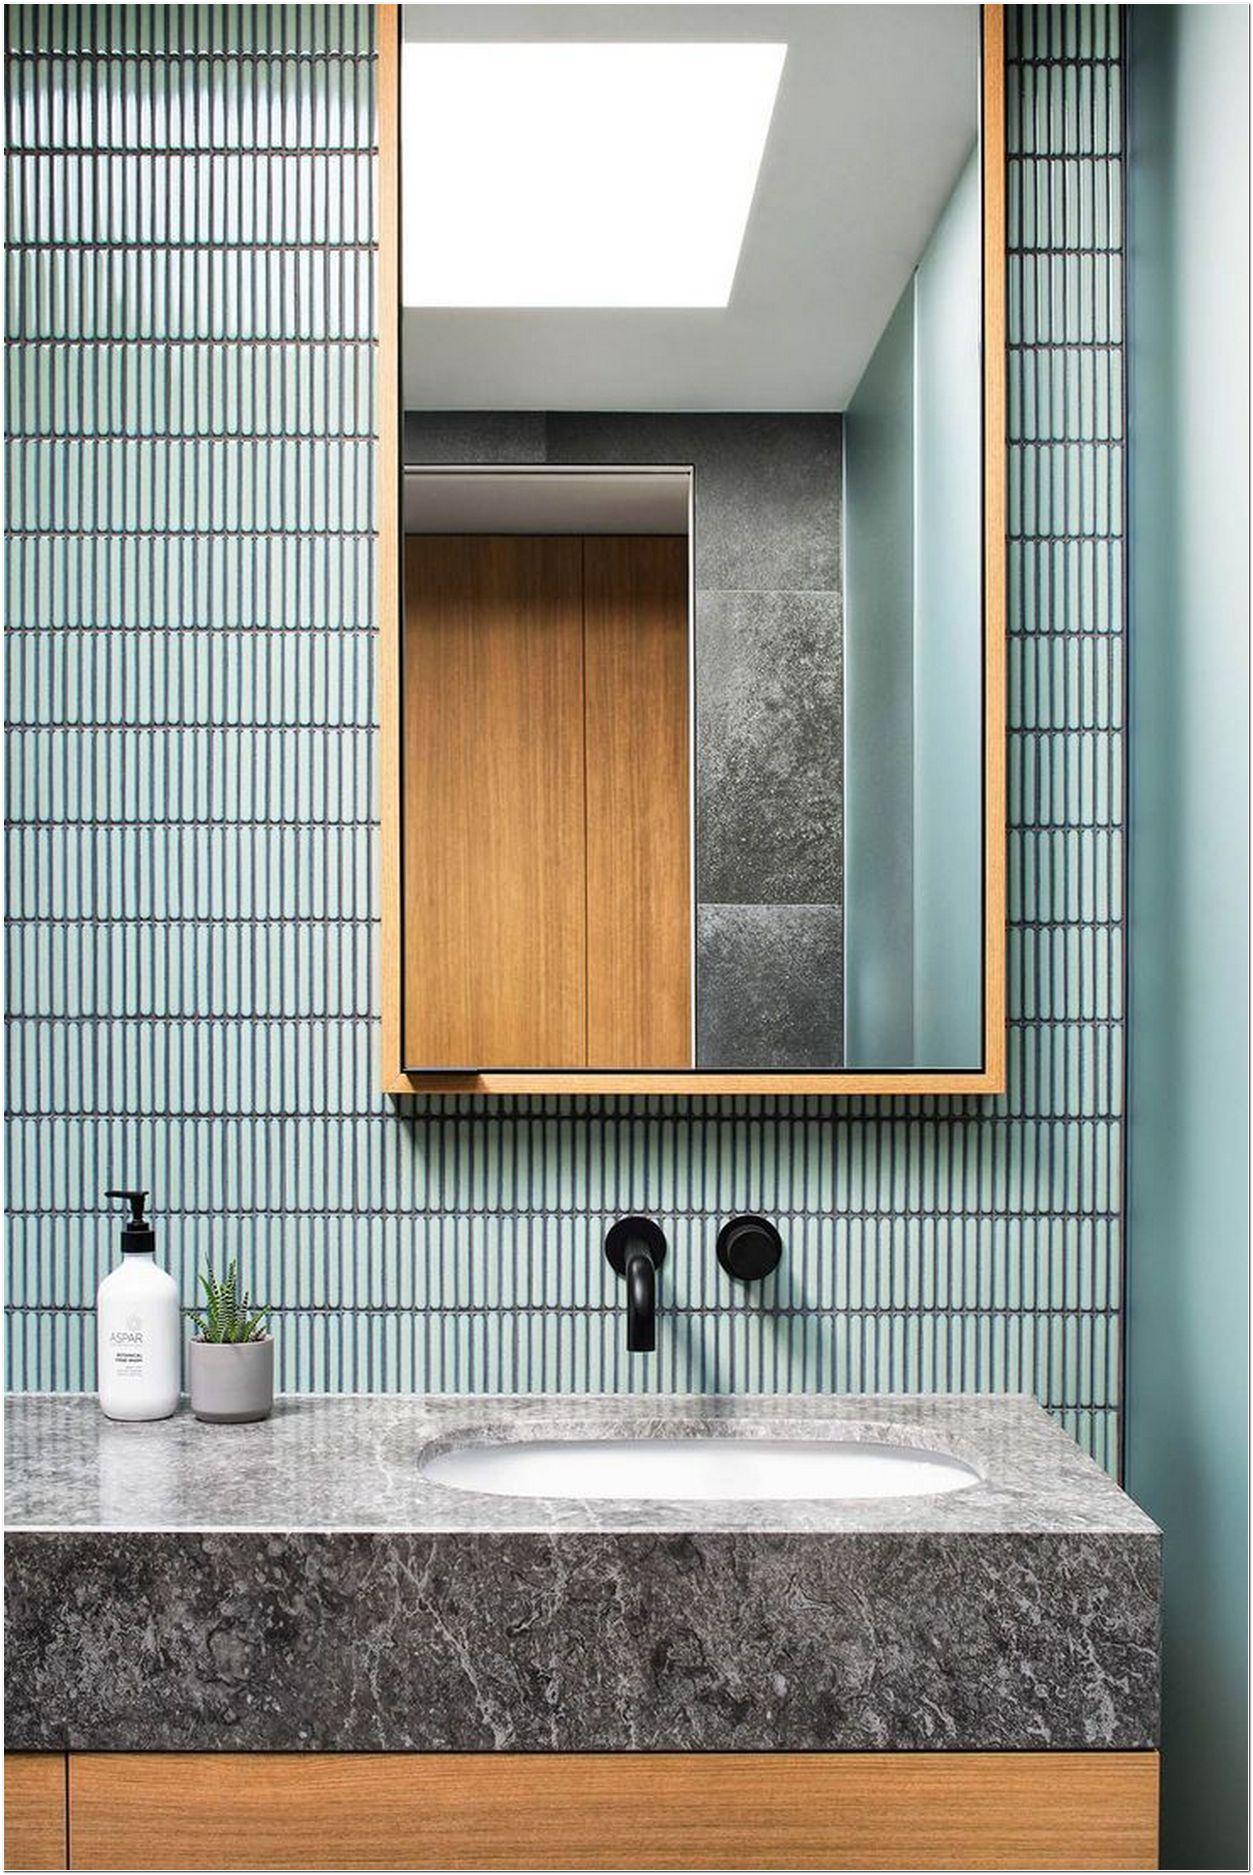 77 Art Deco Bathroom Design Ideas The New Way Of Colouring The Bathroom Myhomeorganic